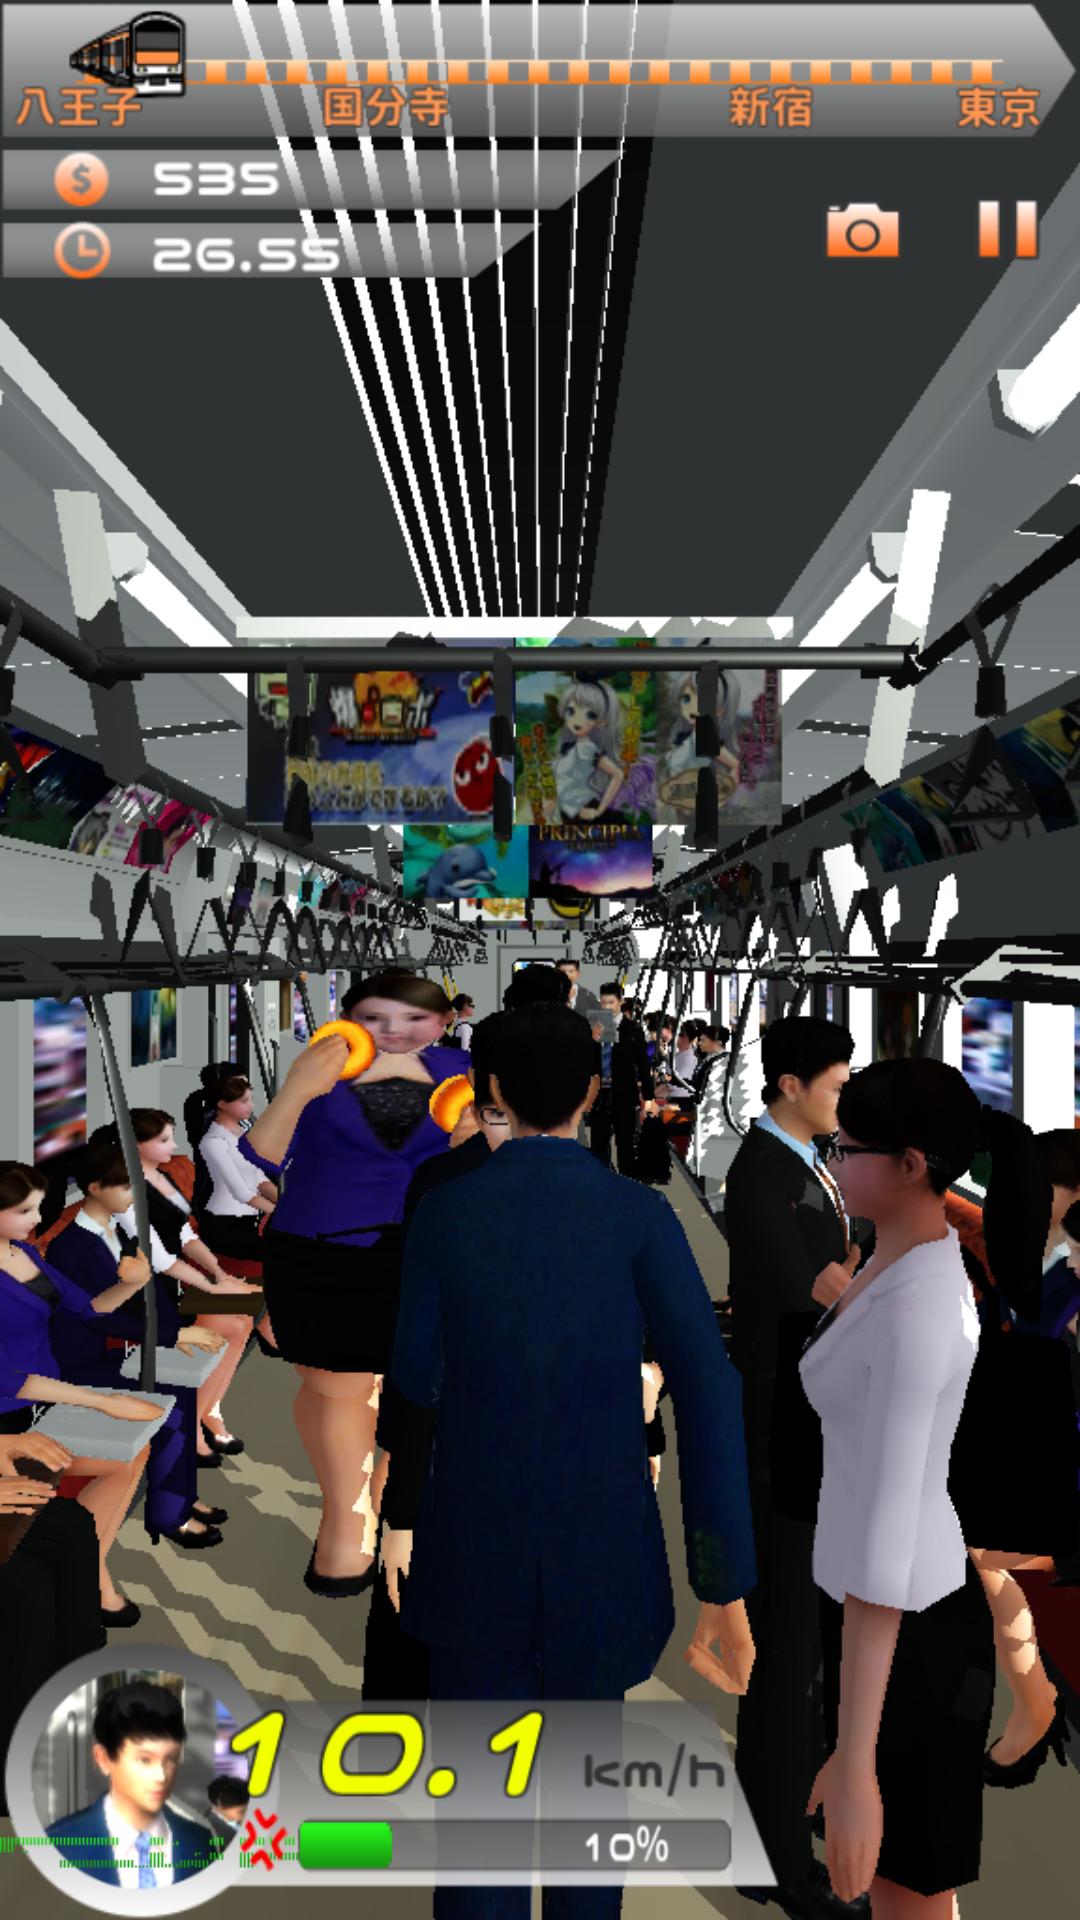 androidアプリ 30秒で通勤する方法〜八王子から東京駅まで〜攻略スクリーンショット3